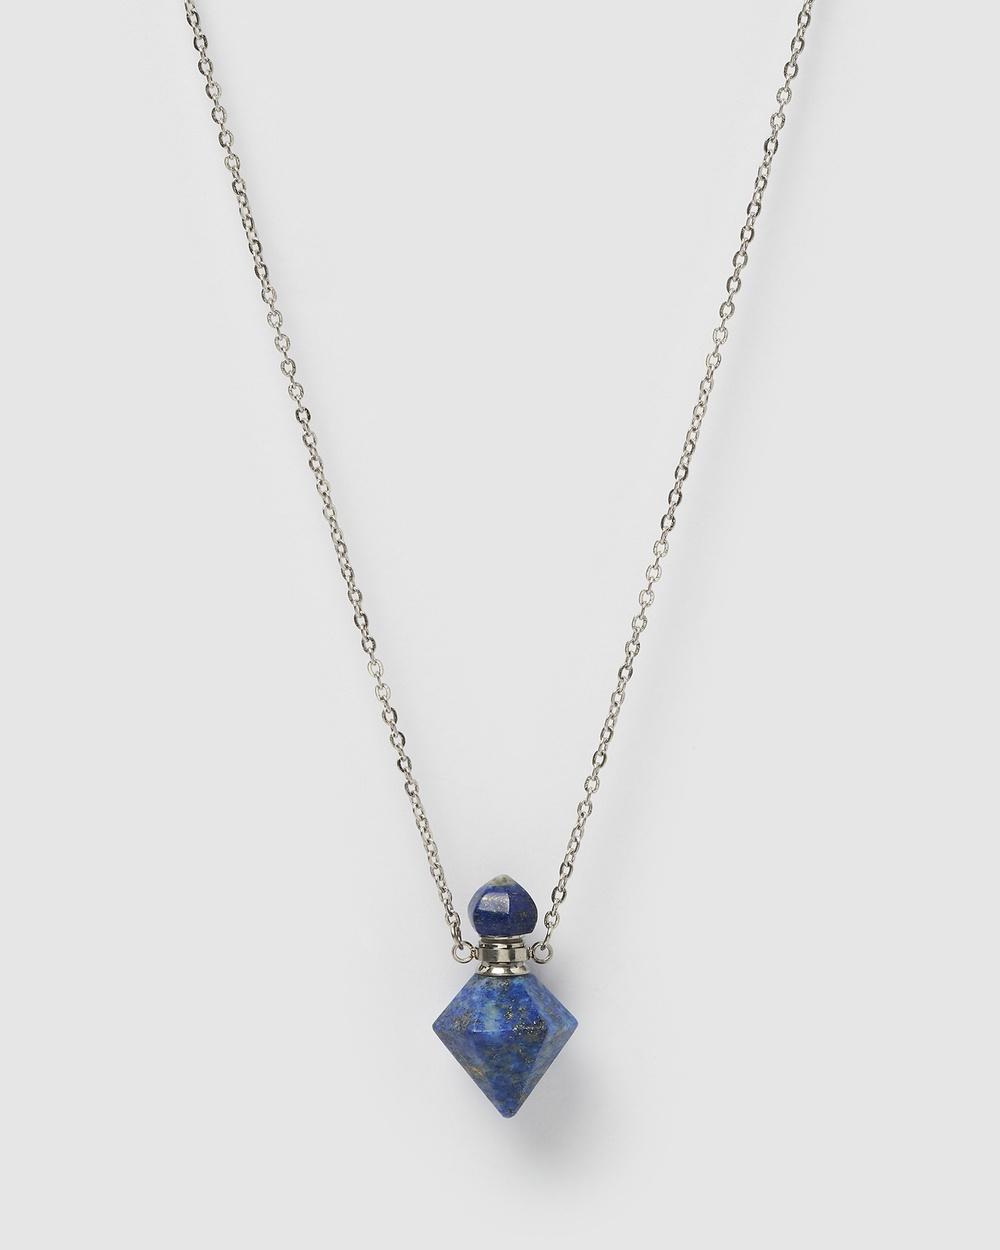 Miz Casa and Co Trix Pendant Perfume Bottle Necklace Jewellery Blue Lapis Silver